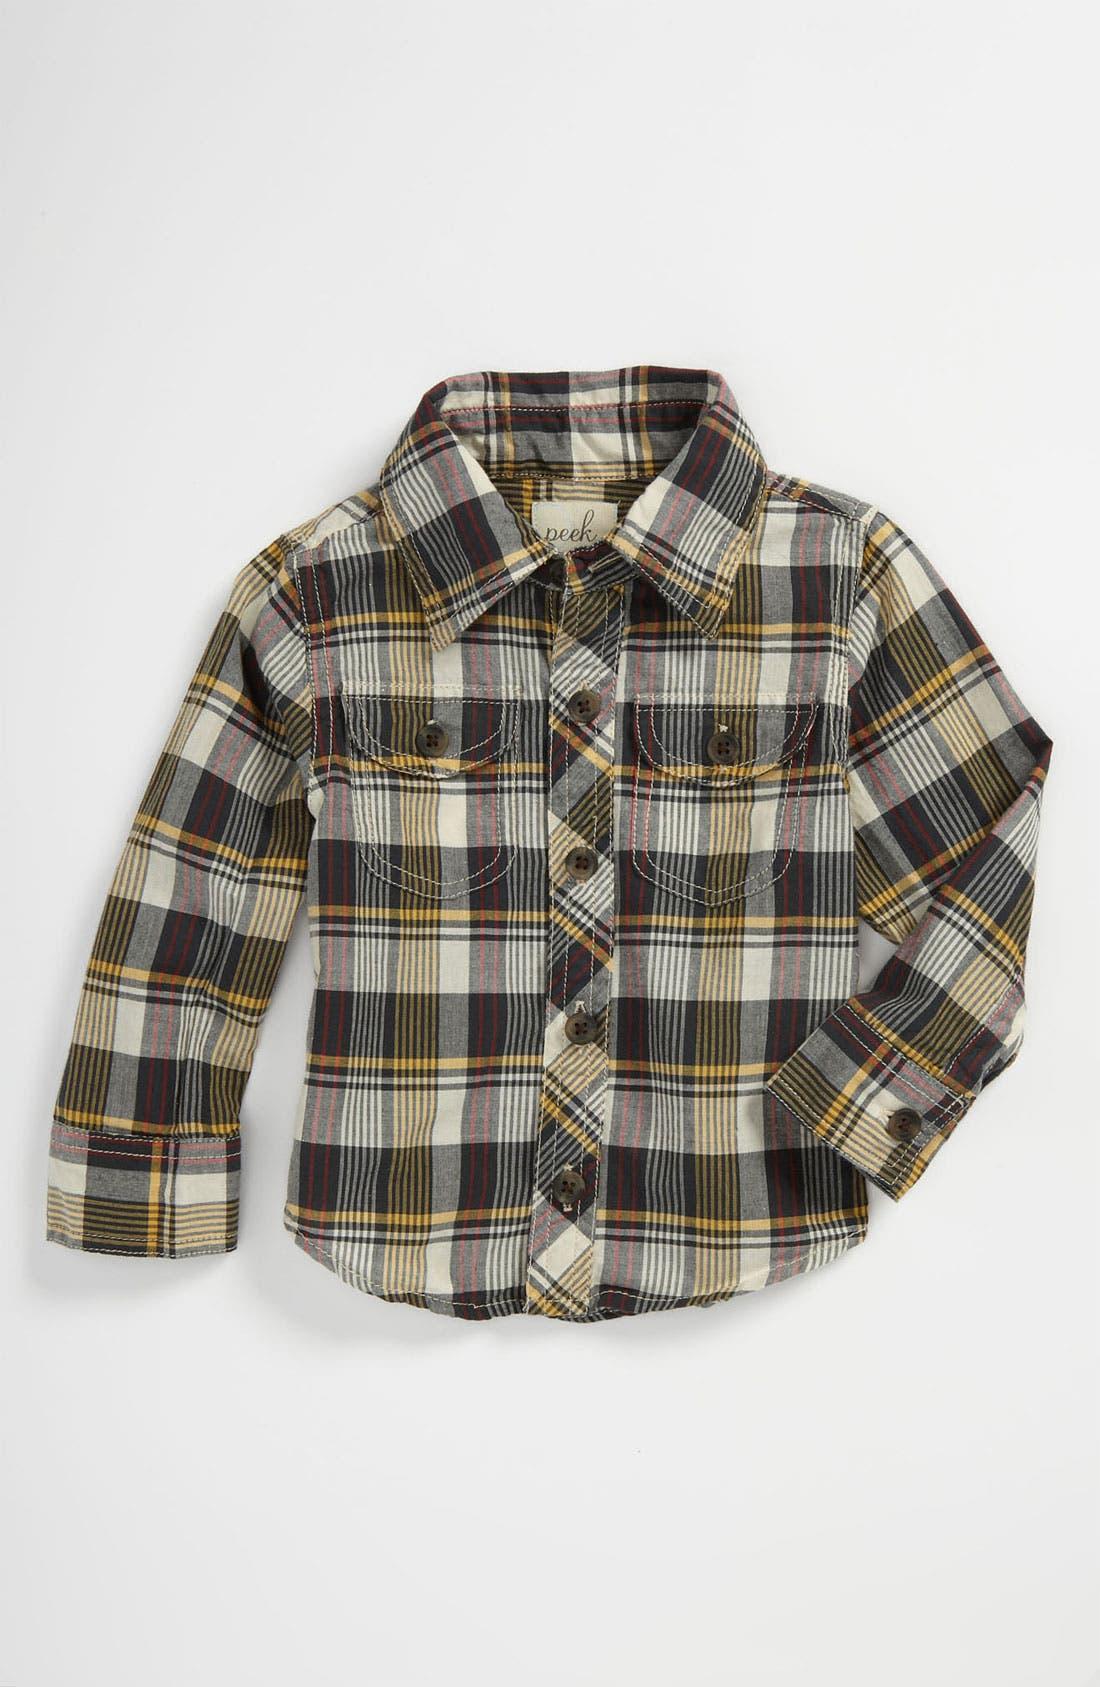 Alternate Image 1 Selected - Peek 'Camden' Plaid Shirt (Baby)